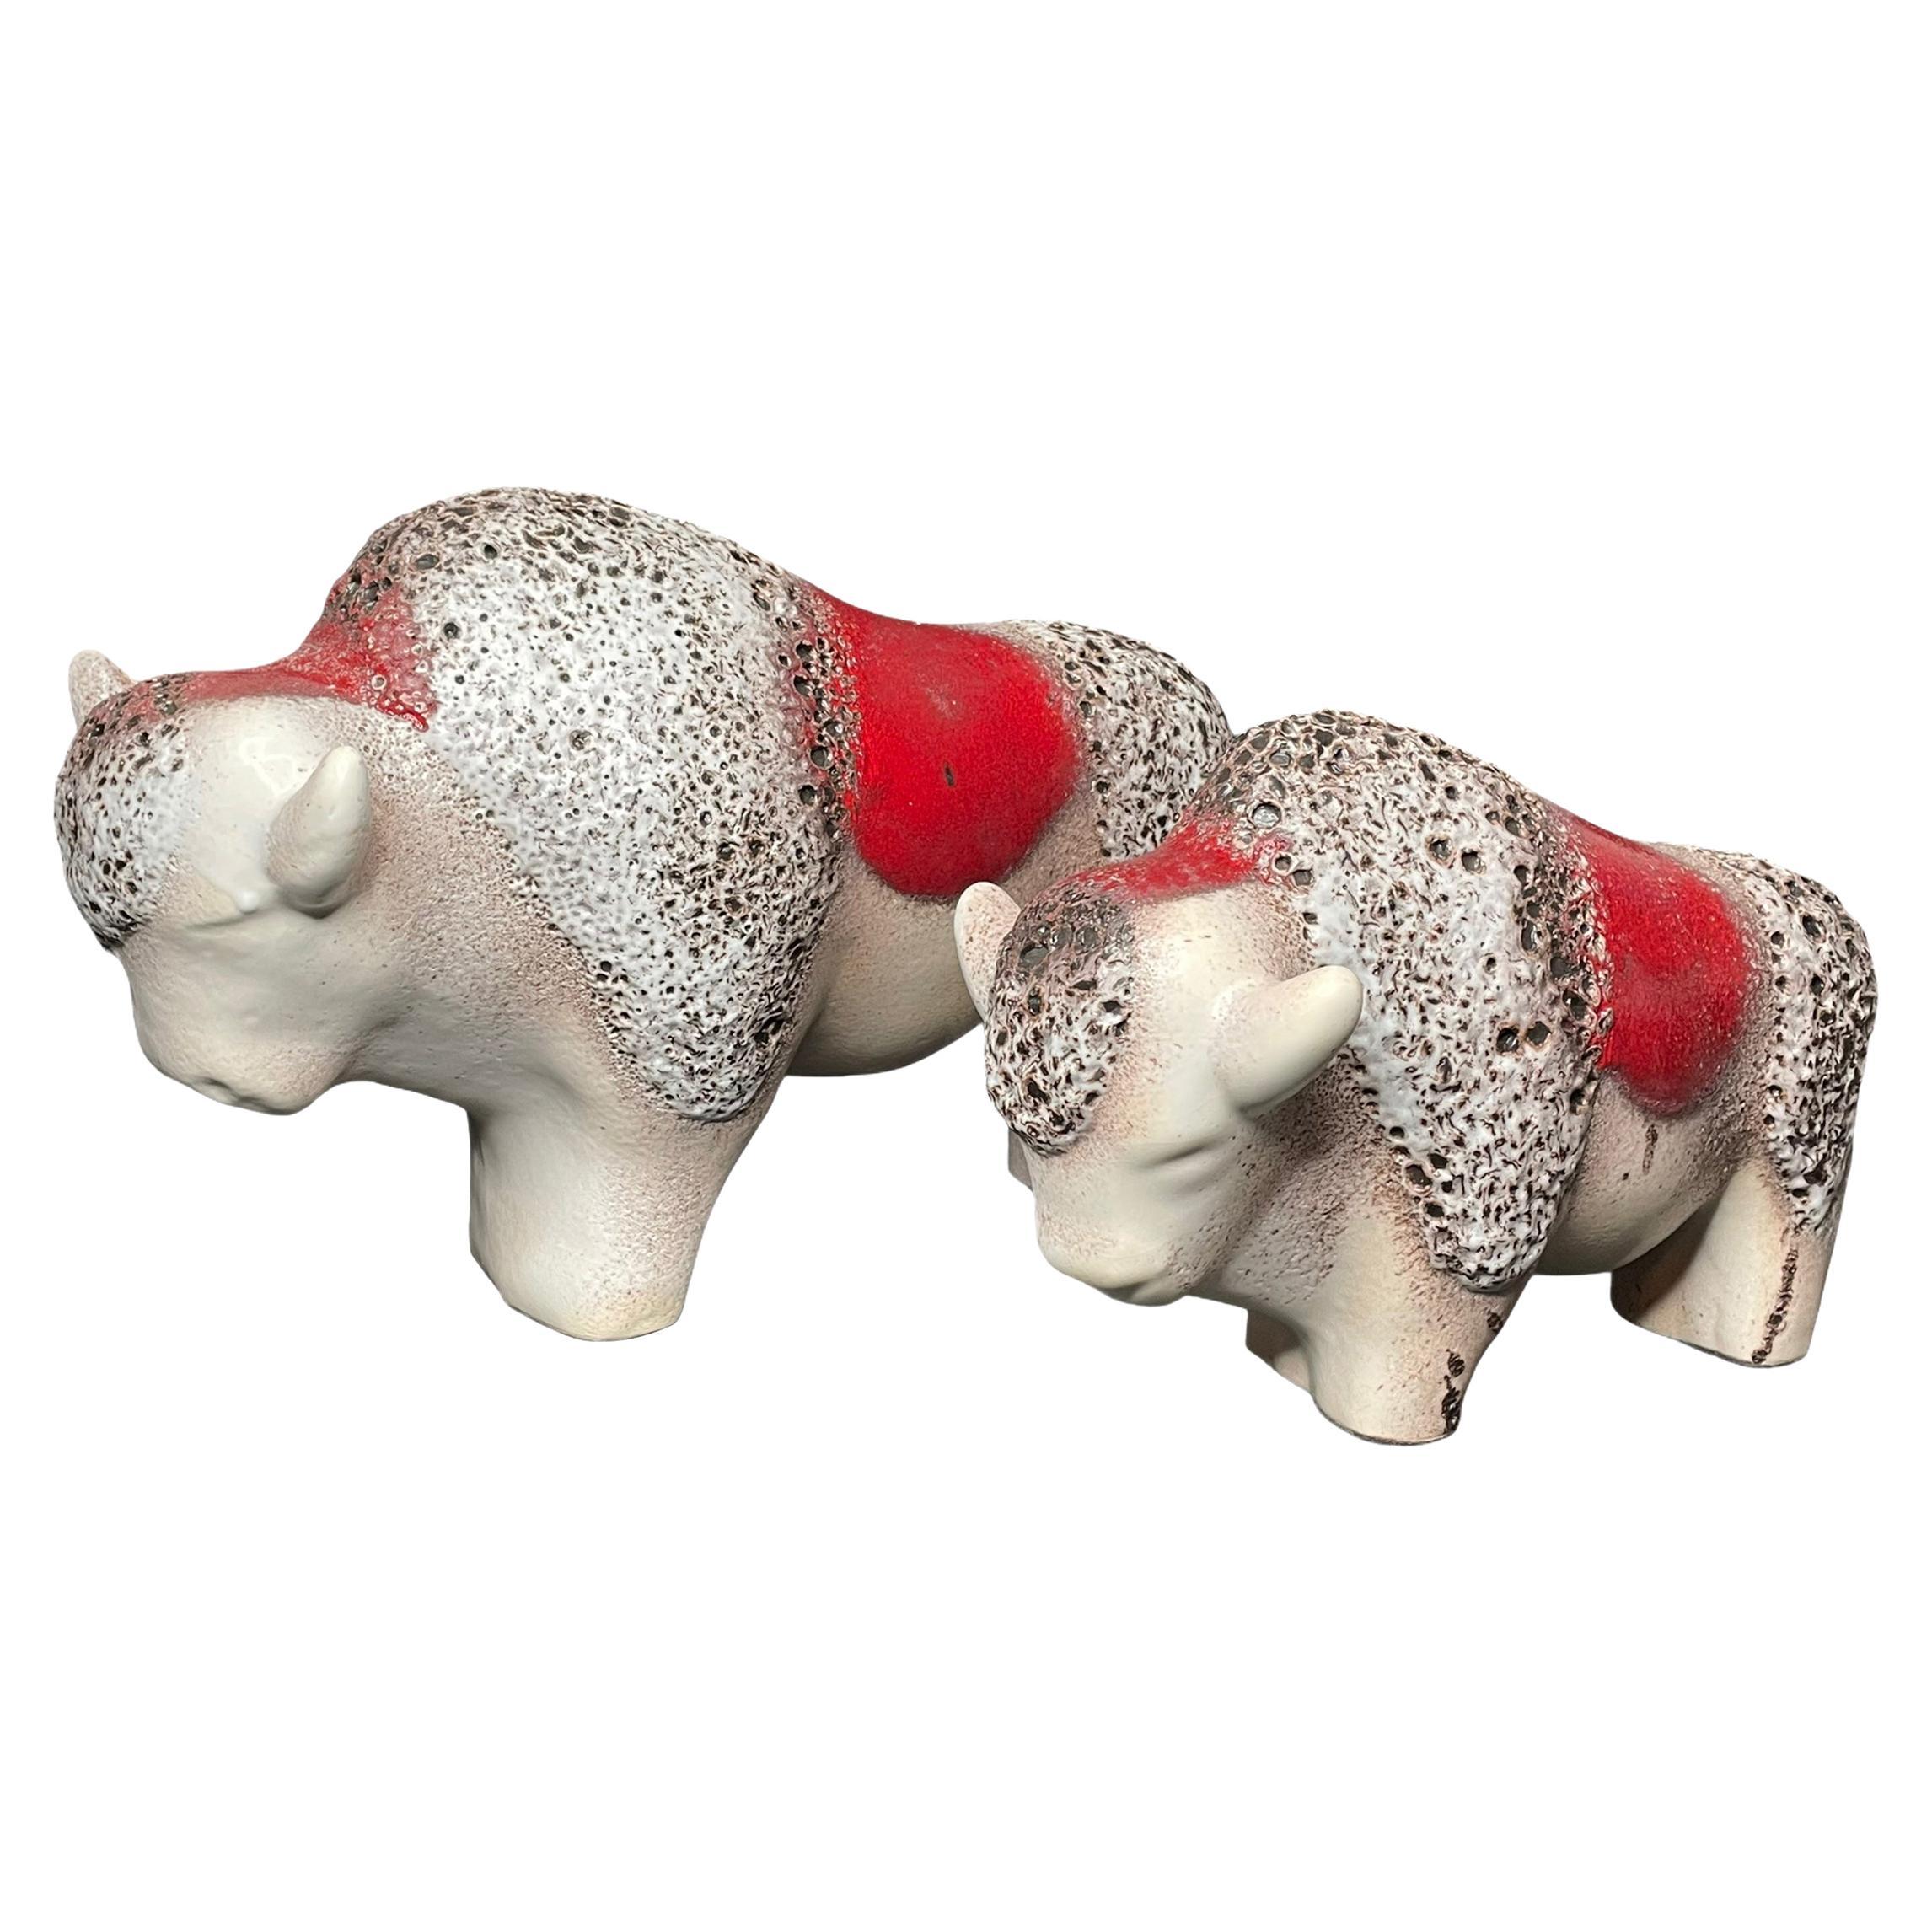 Set of Two Stunning Bull Statue Fat Lava Ceramic by Otto Keramik Germany 1970s